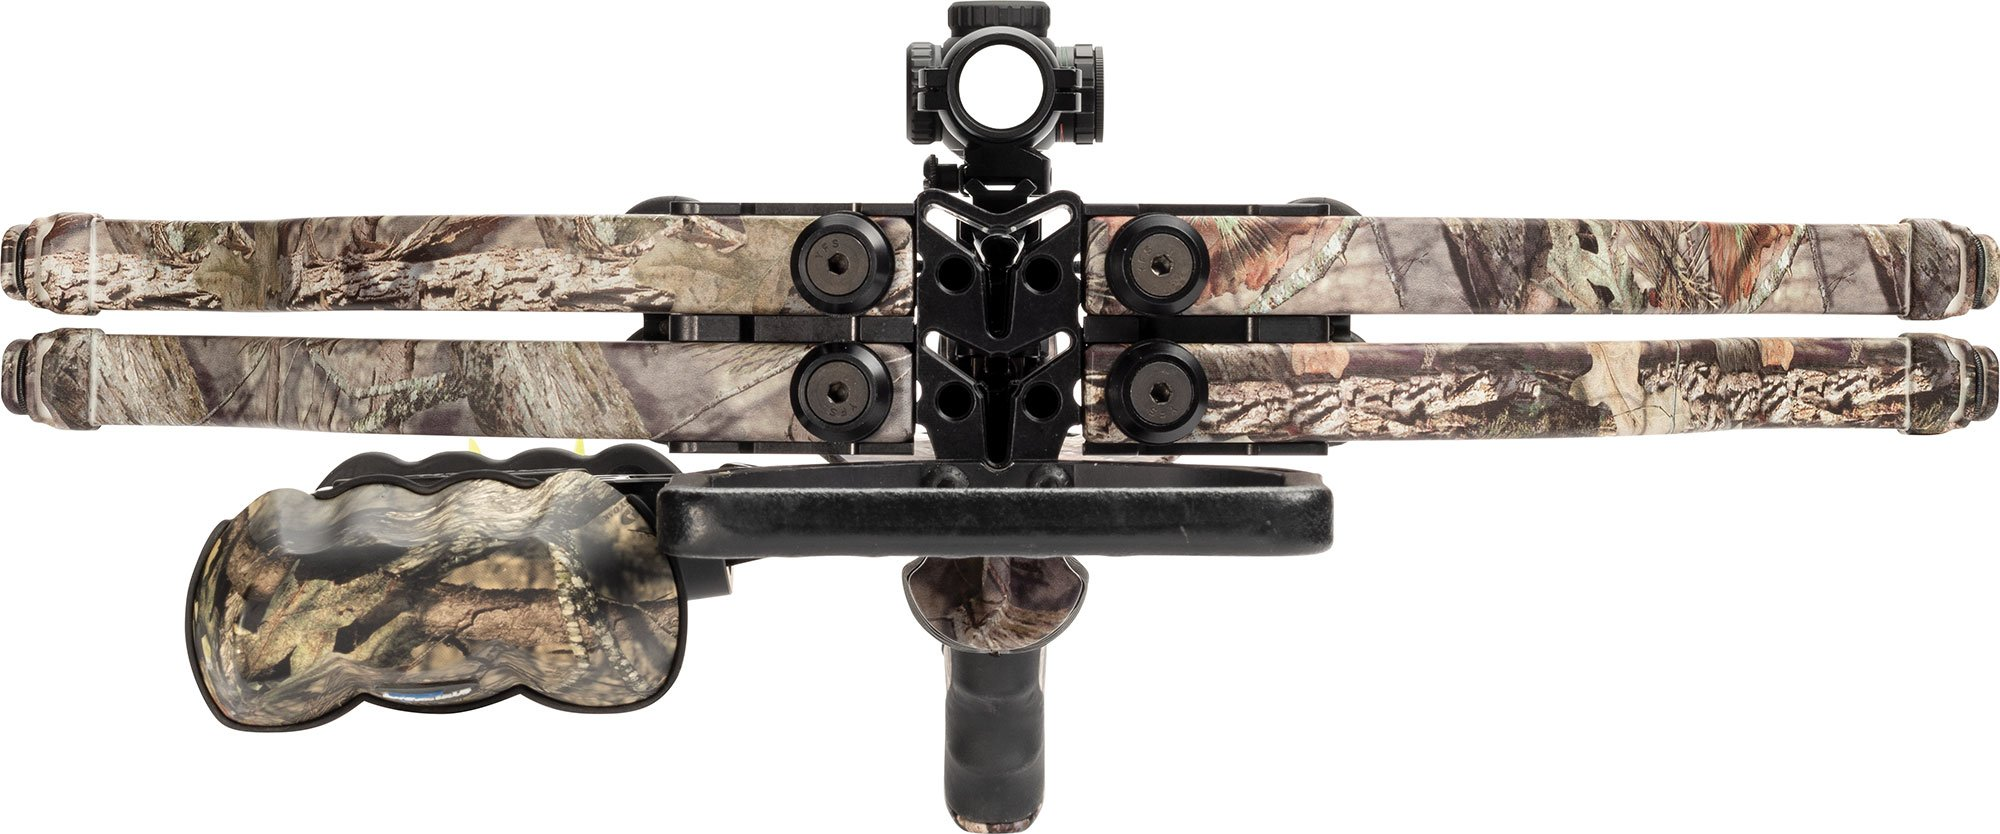 Excalibur TwinStrike Armbrust-Set mit Dual-Fire Technologie True Timber Strata